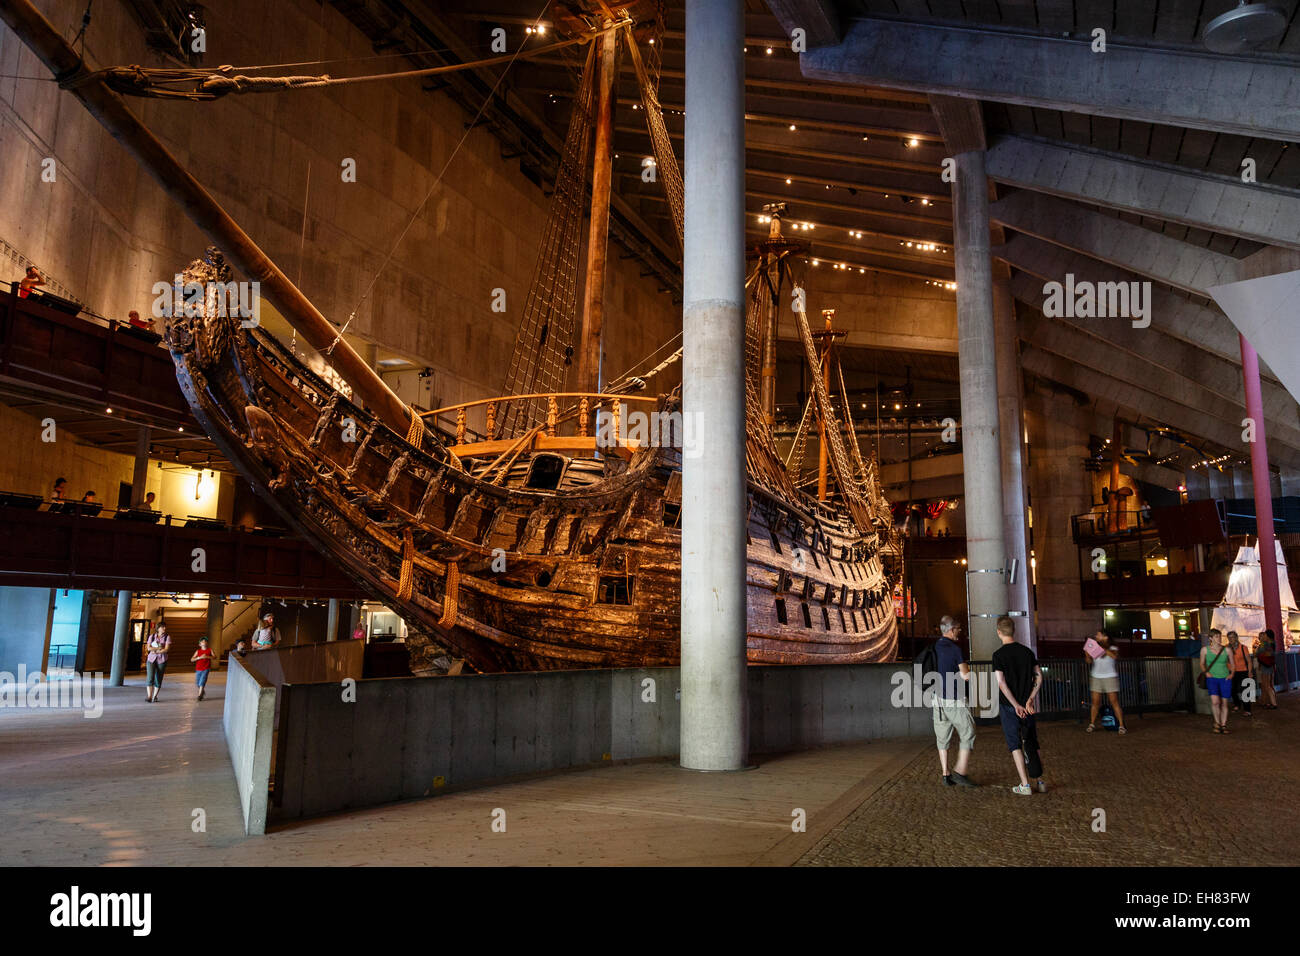 Museo Vasa, Djurgarden, Stoccolma, Svezia, Scandinavia, Europa Immagini Stock